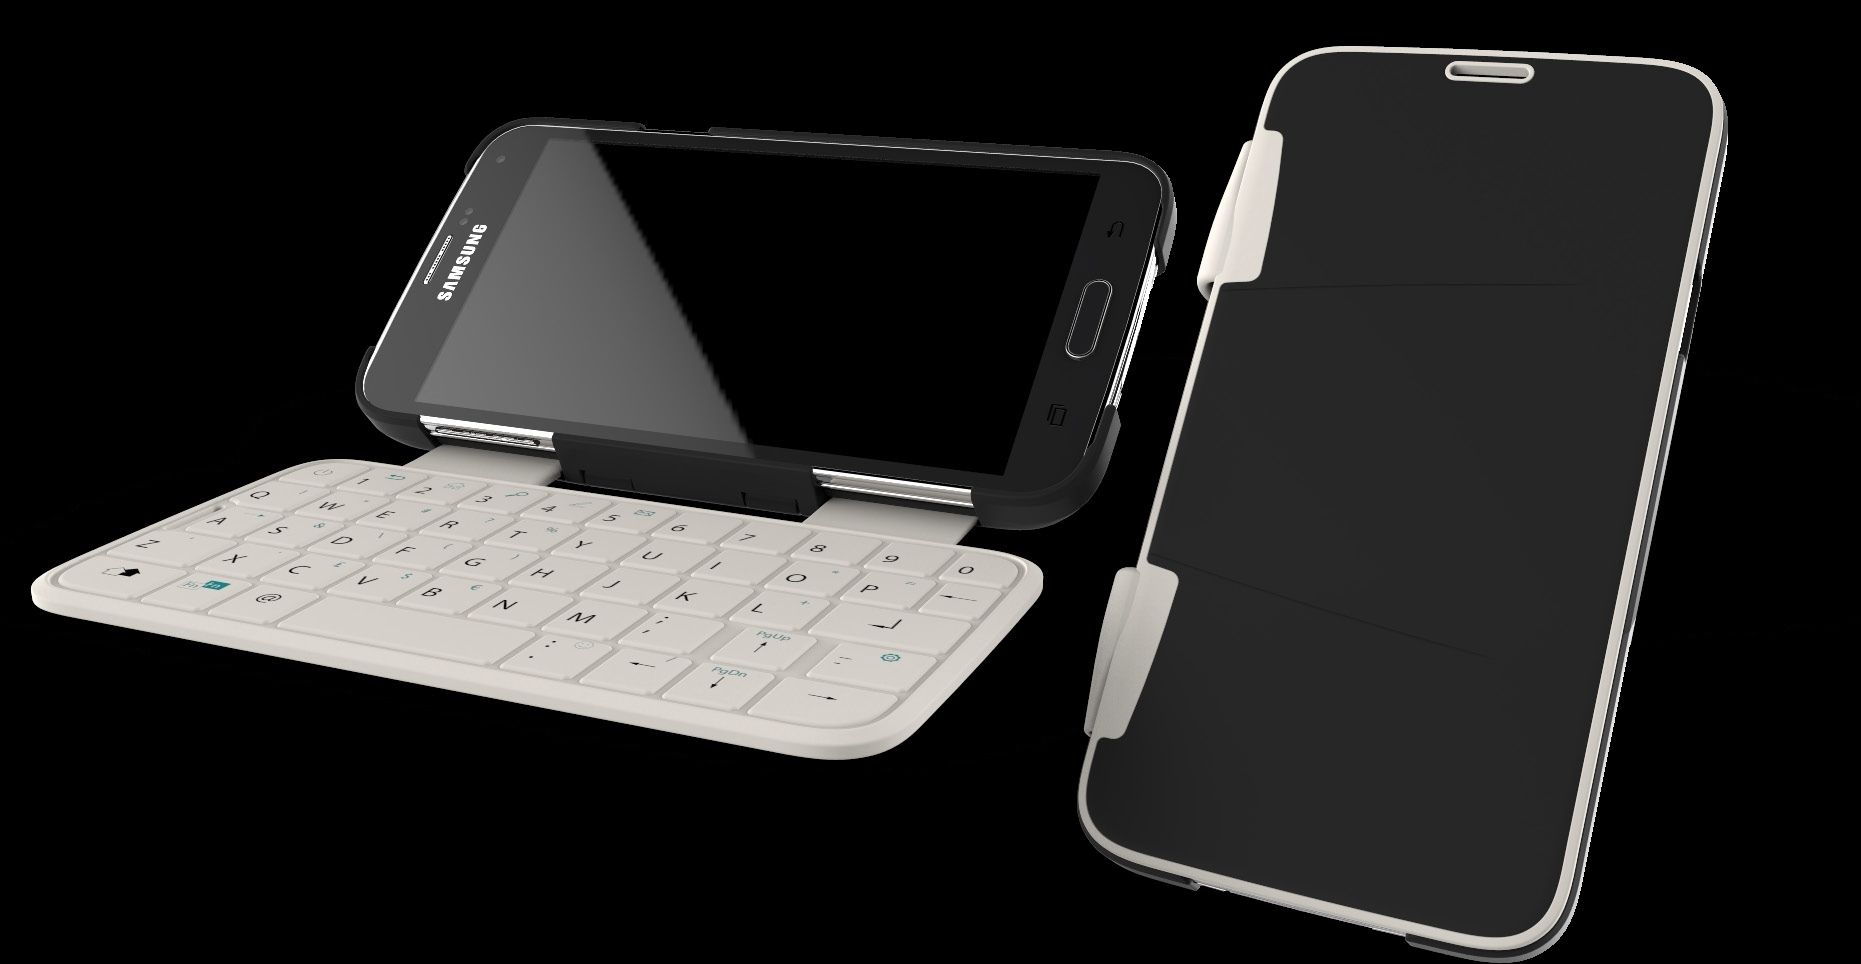 Dette tastaturet til Samsung-telefoner bruker NFC (Near Field Communication) for trådløs overføring, og trenger ikke batterier. Viktige faktorer her var at tastaturet skulle fungere under røffe forhold, og være levedyktig i et prispresset marked. Eker Design